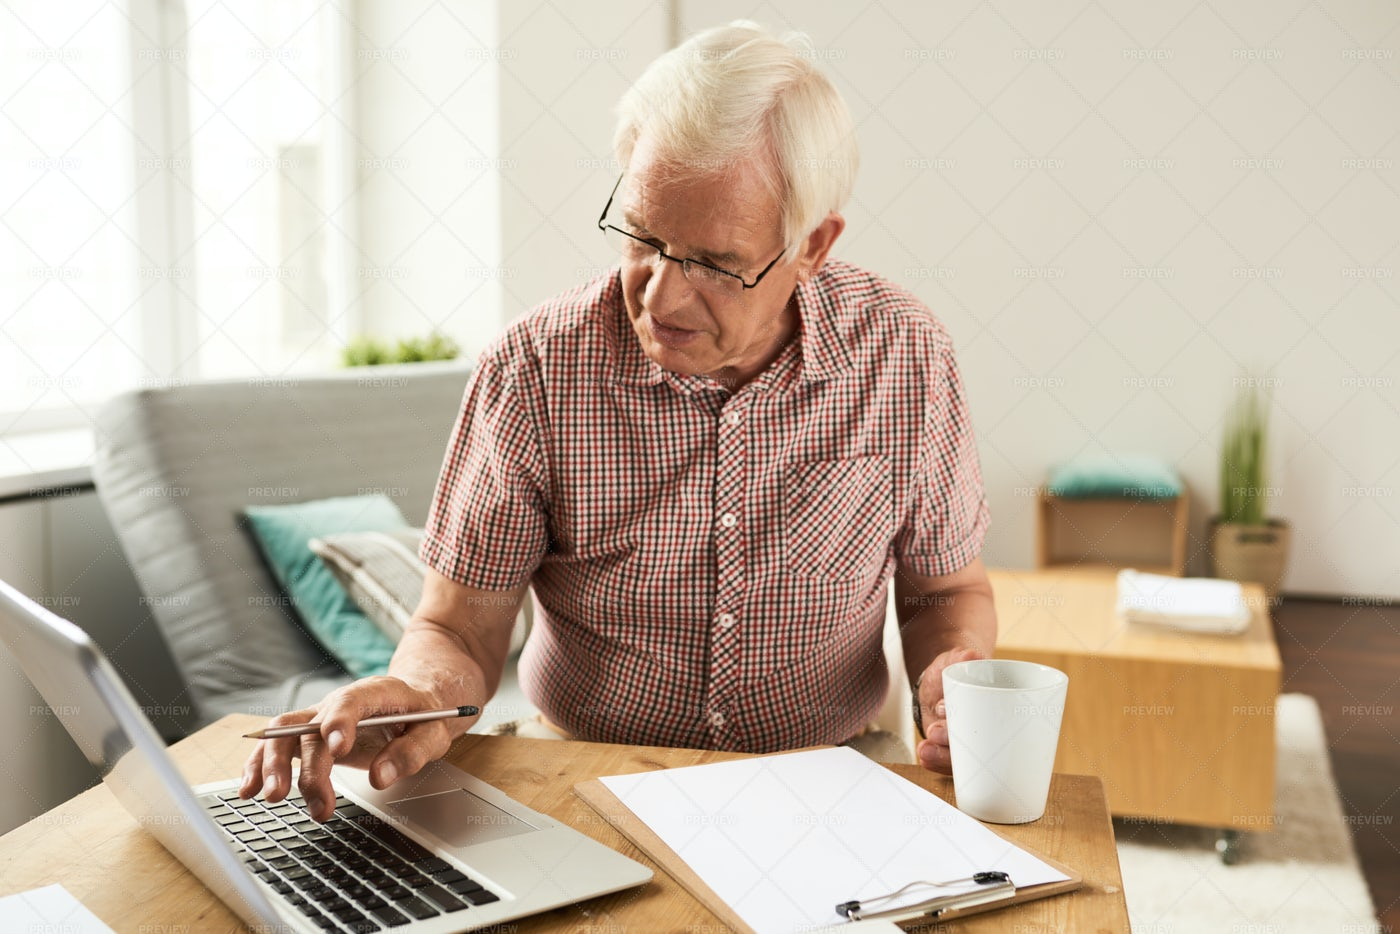 Senior Man Working With Laptop At...: Stock Photos